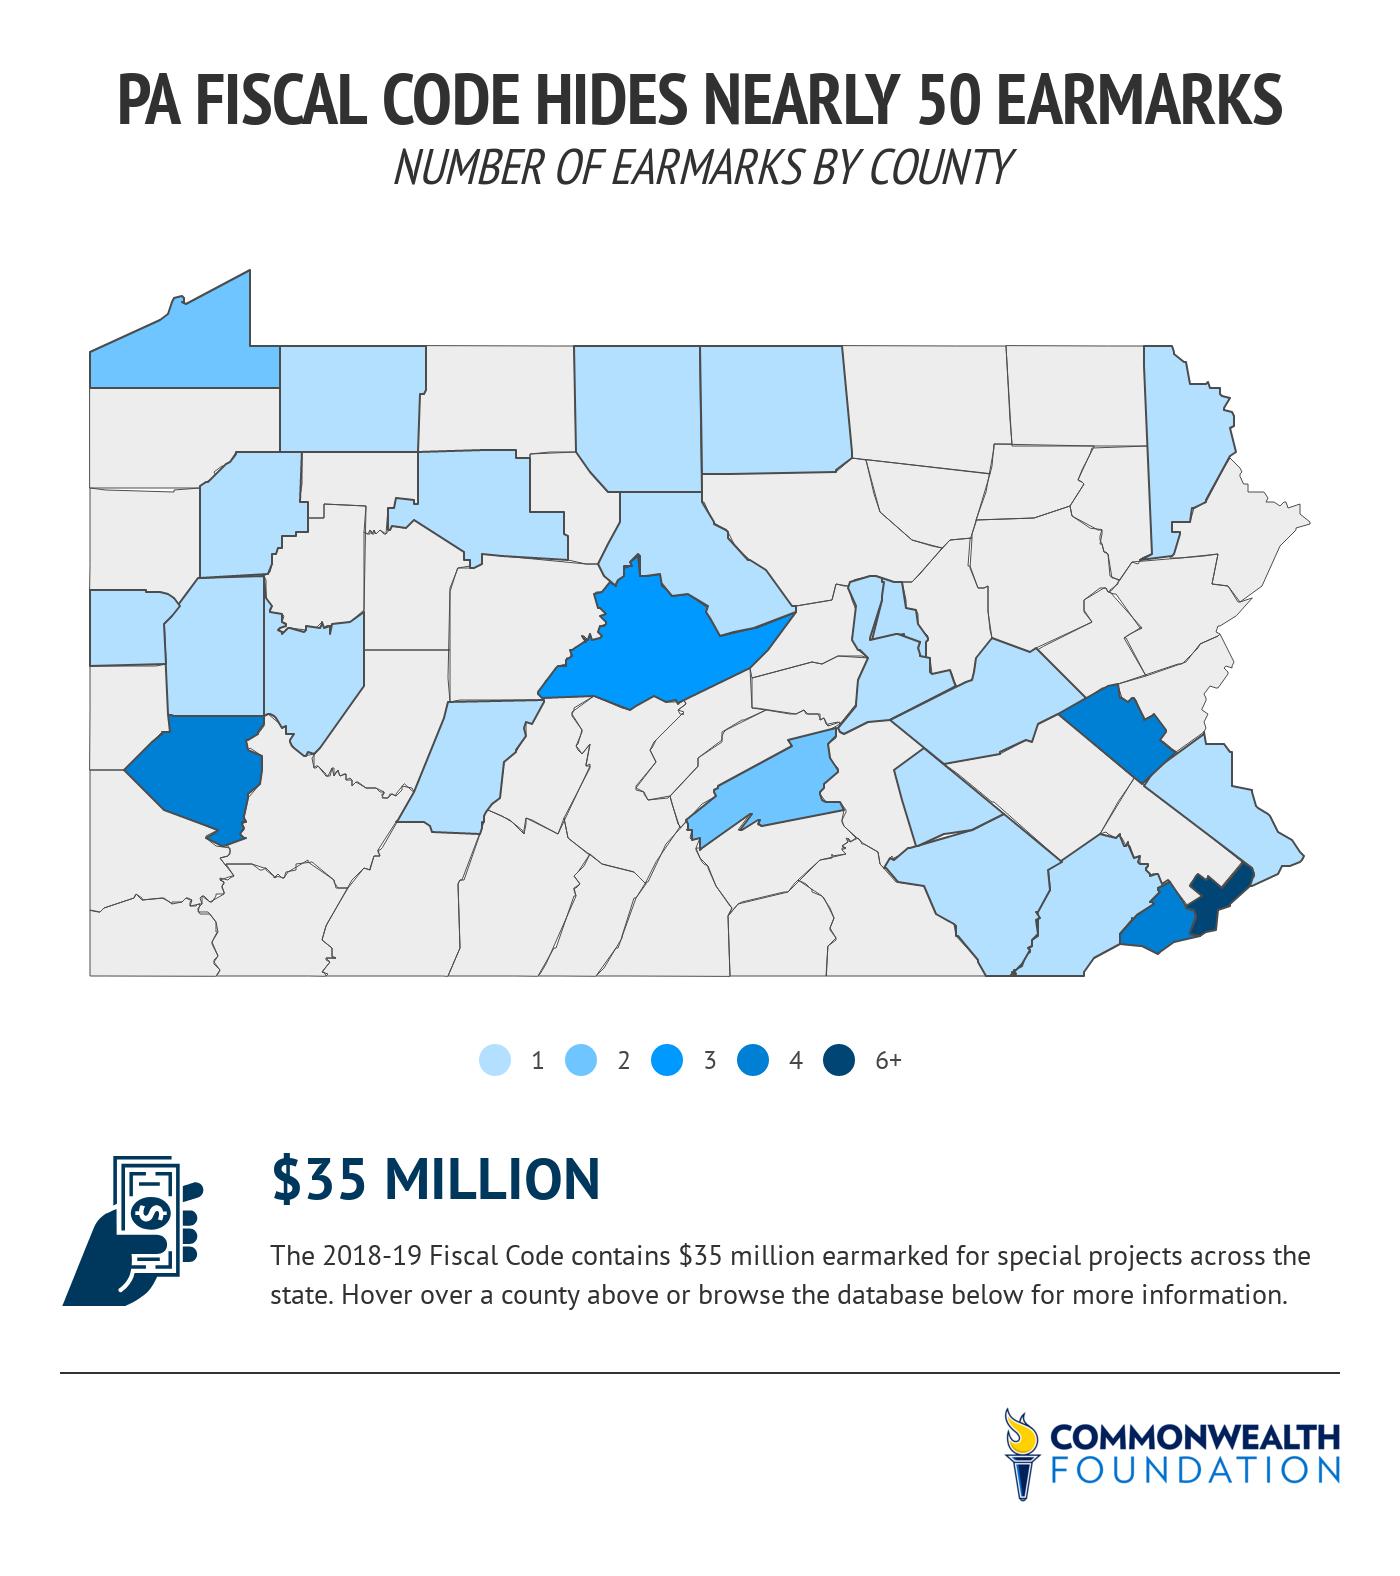 fiscal-code-earmarks-2018-19.png